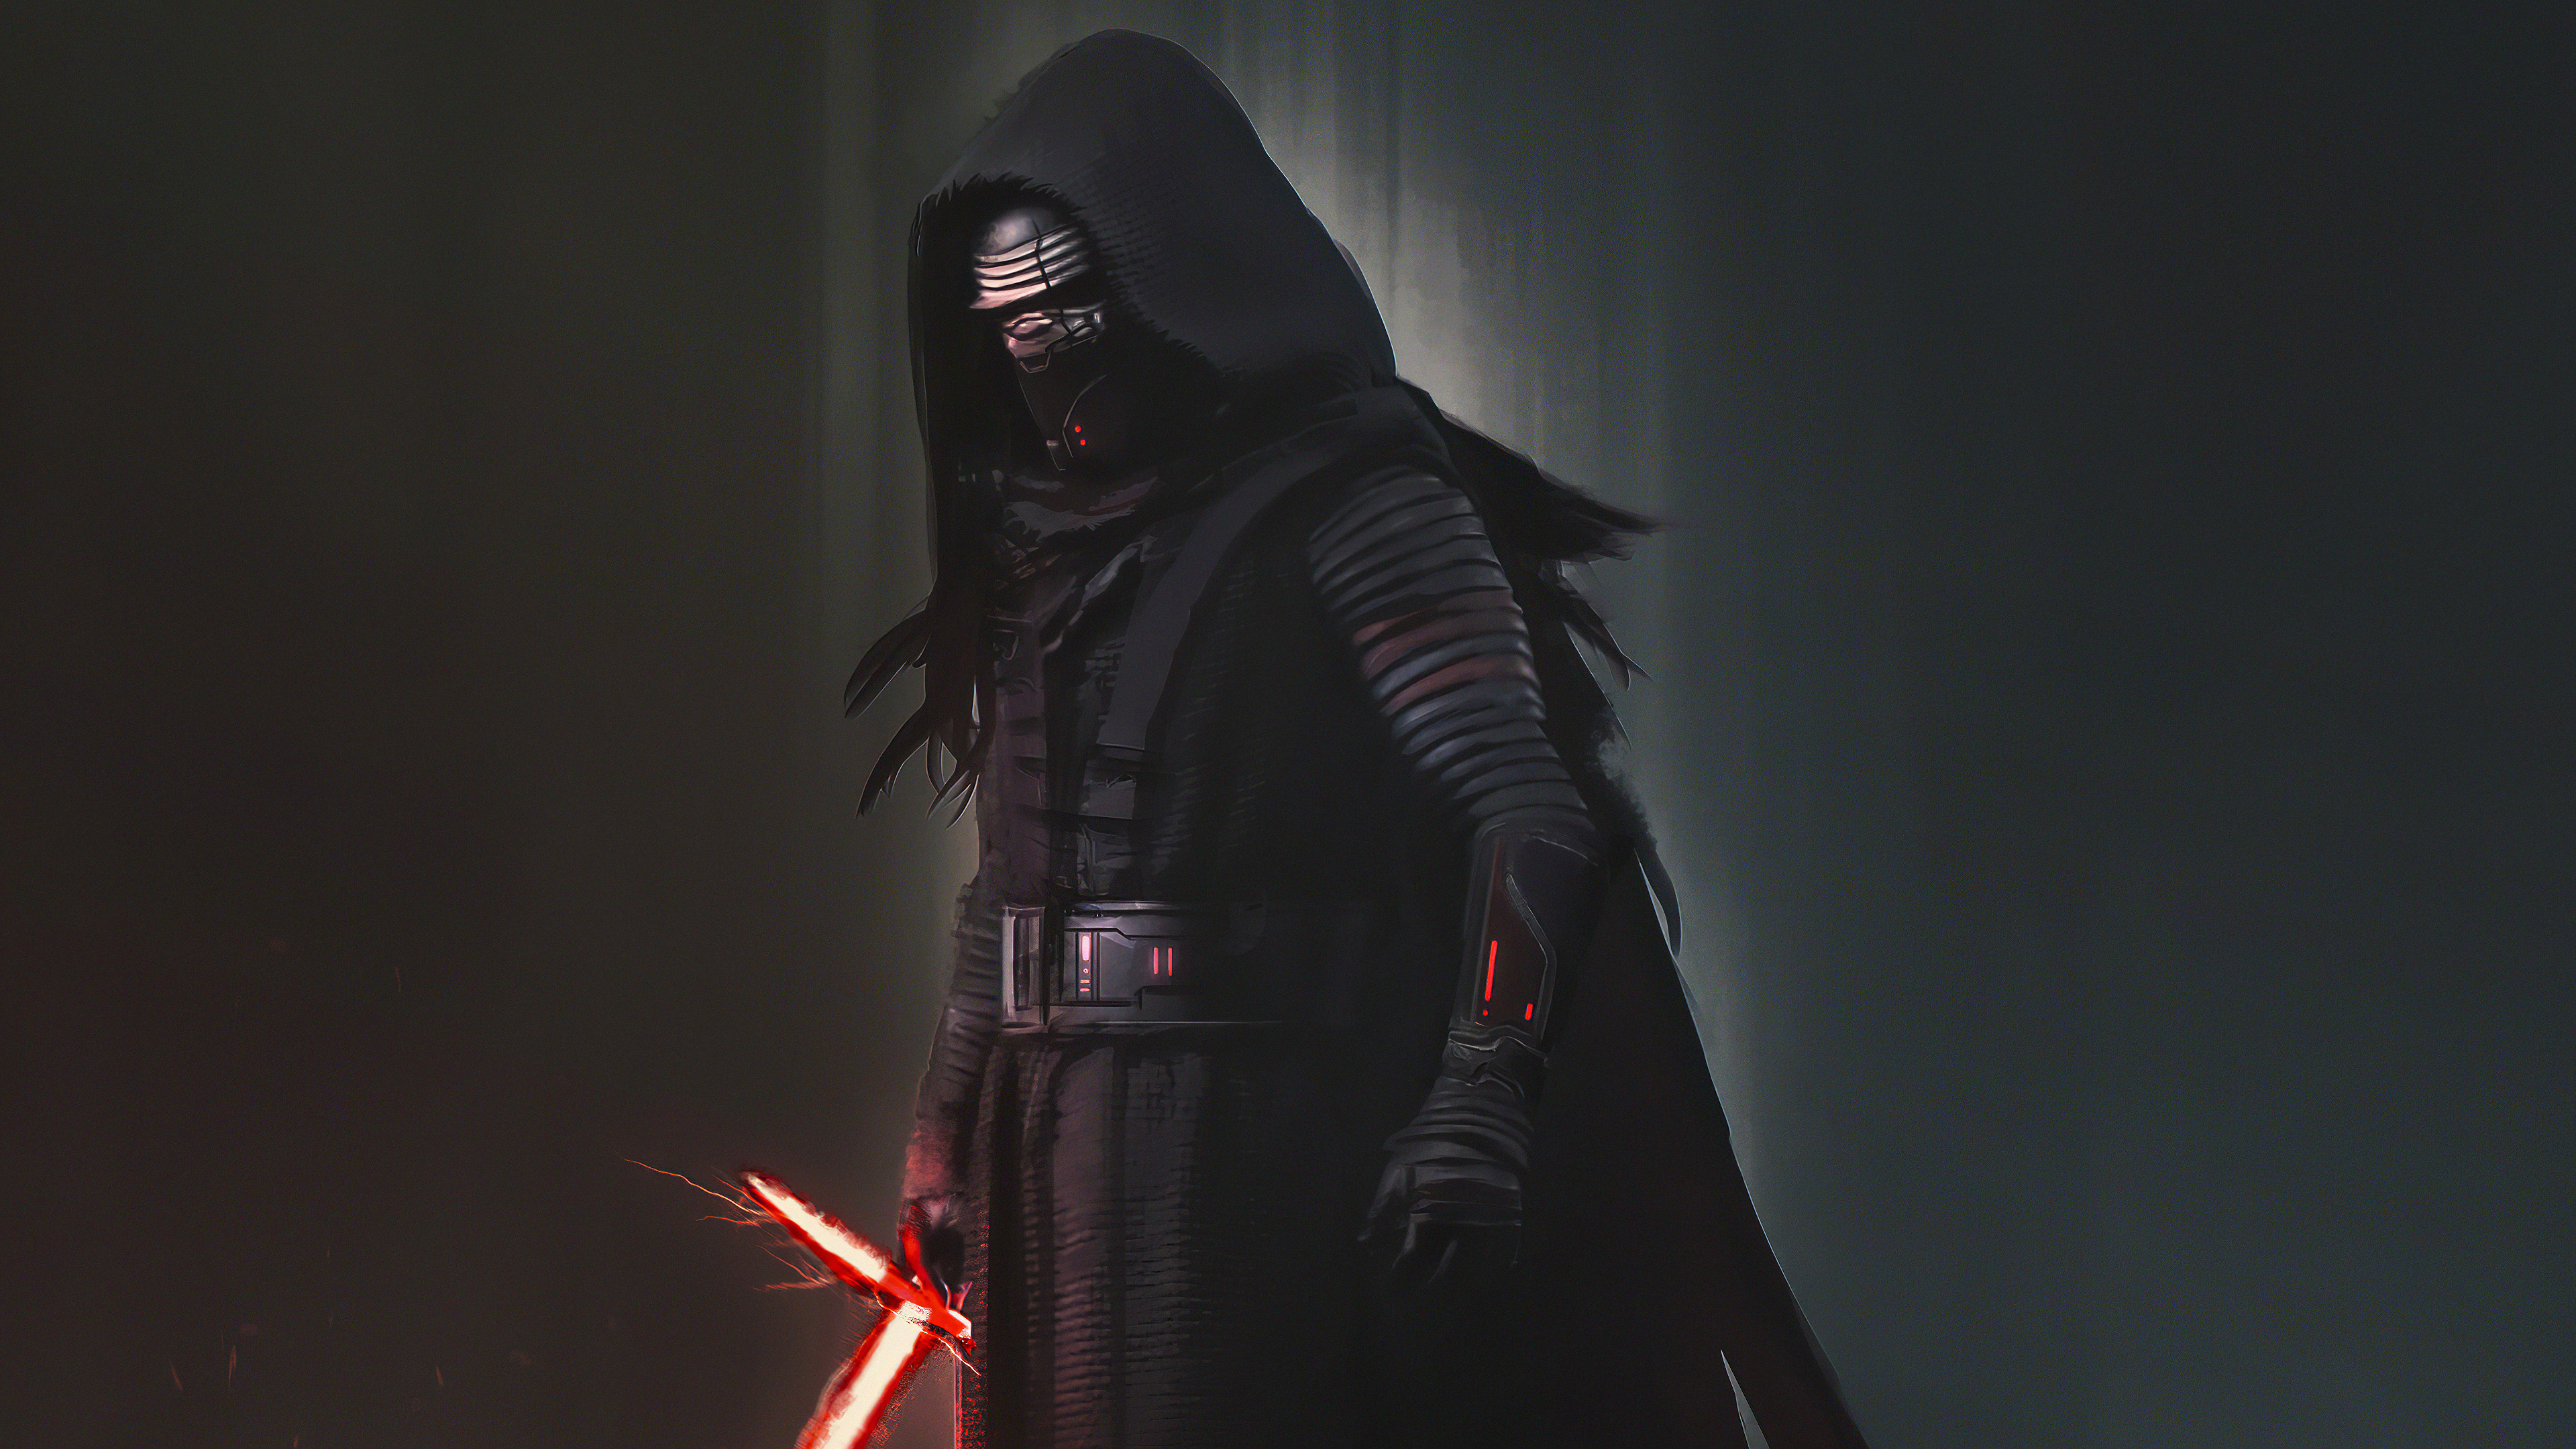 Darth Vader 4k Artwork Hd Movies 4k Wallpapers Images